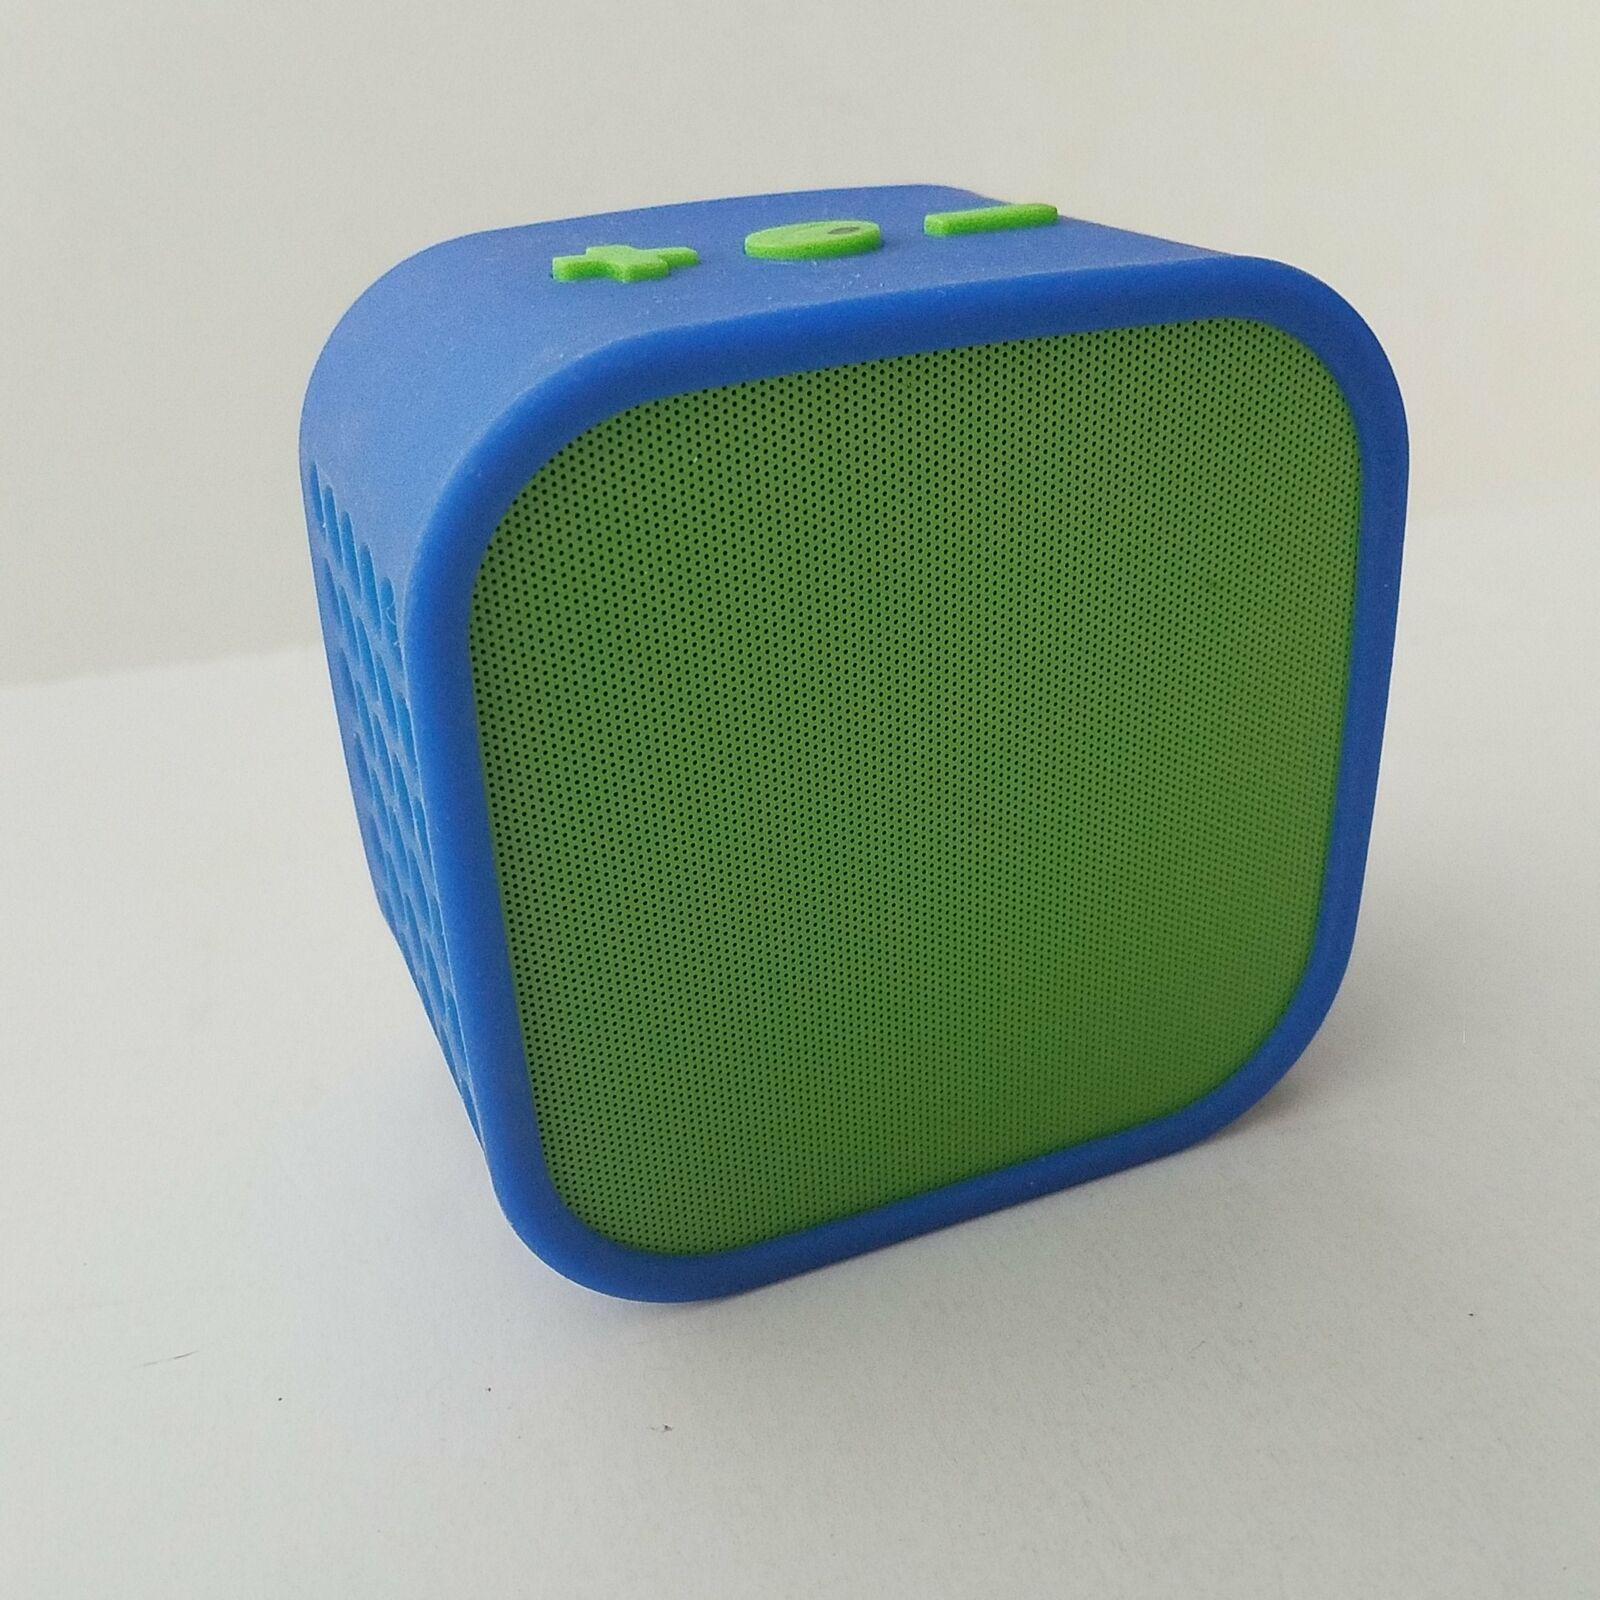 Vivitar Infinite Portable Wireless Bluetooth Speaker MID# 9